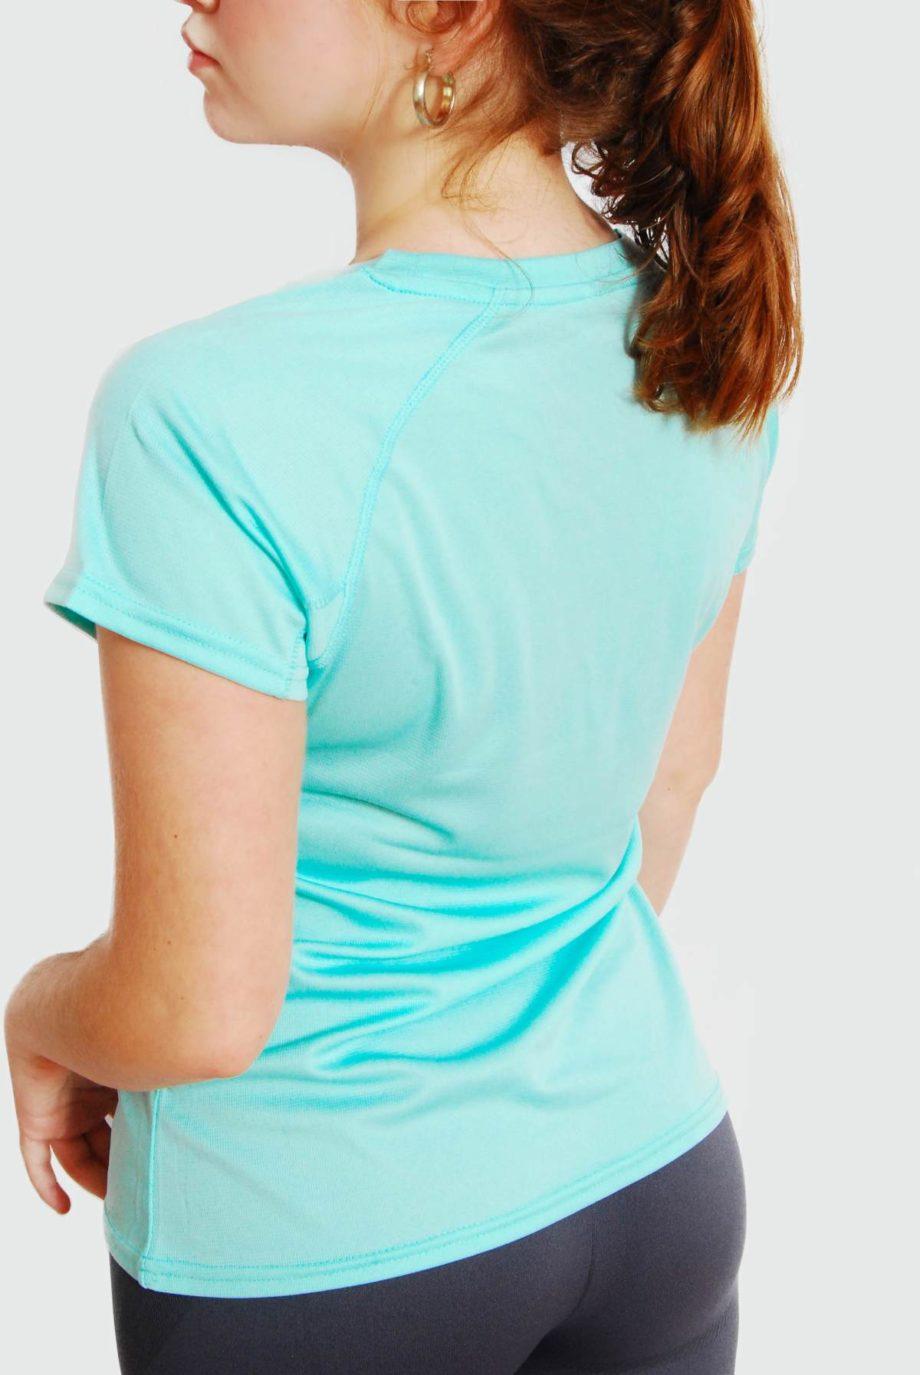 Camiseta deportiva mujer